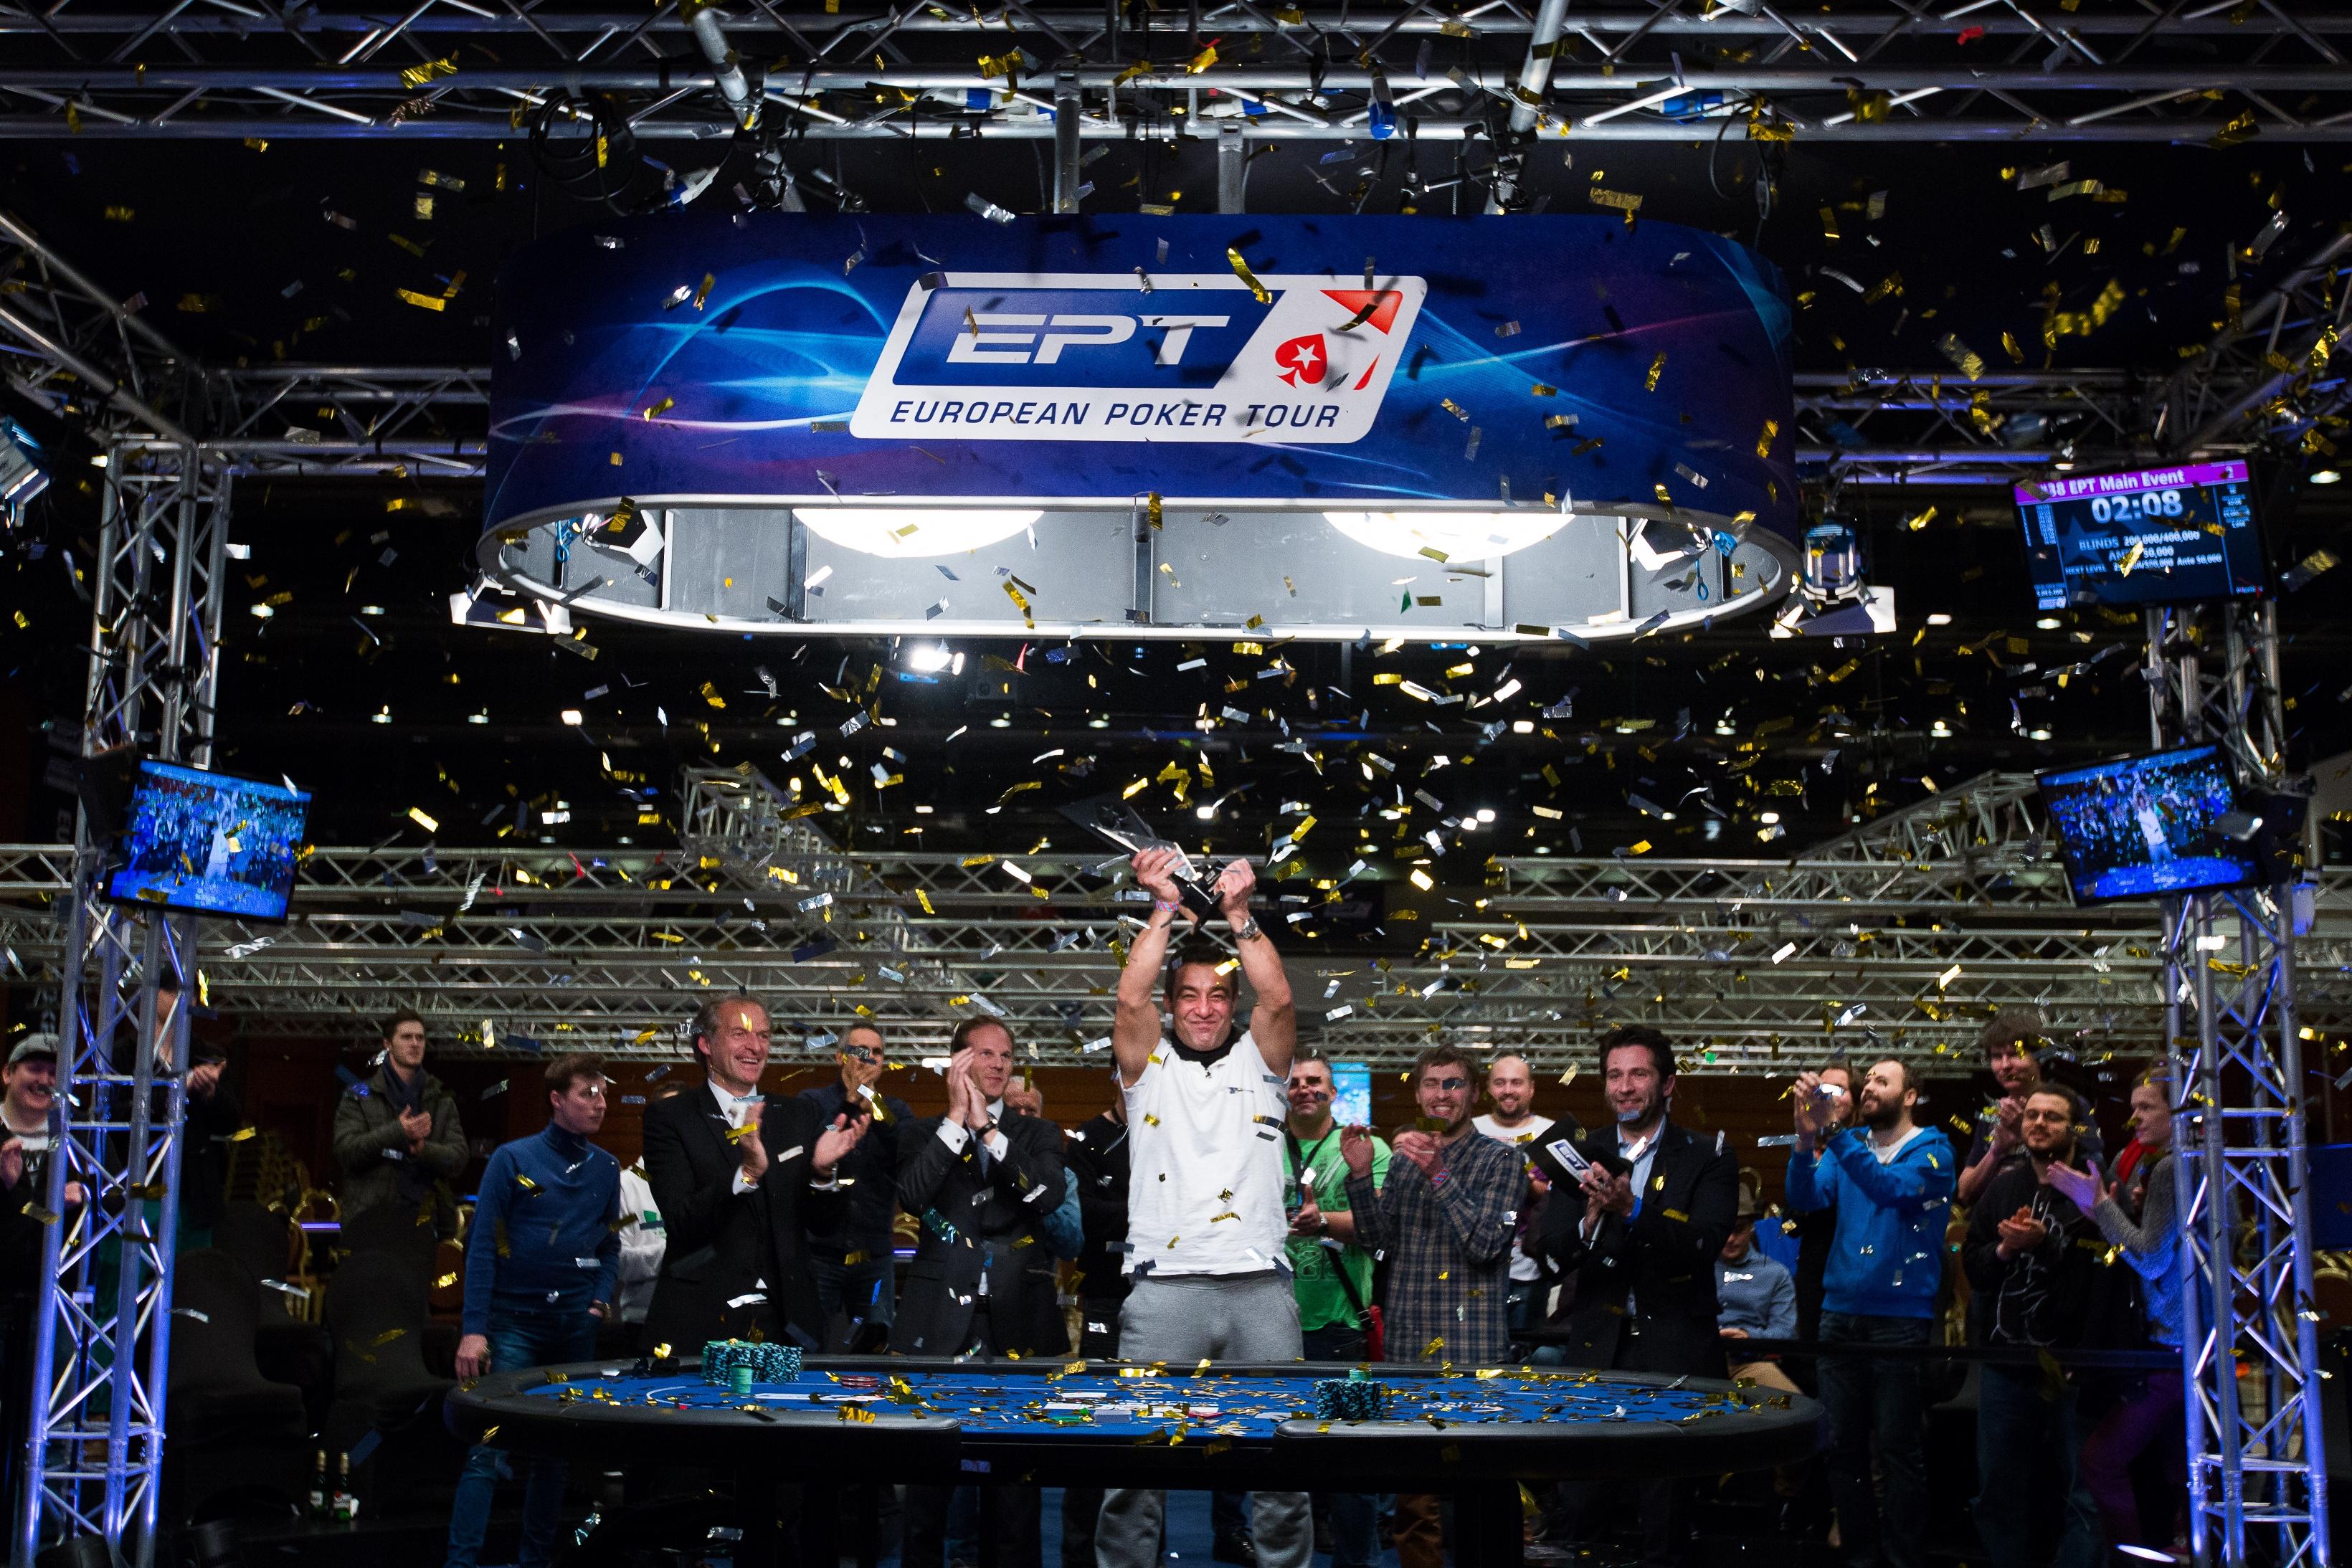 Prague Set To Host The Biggest Pokerstars European Poker Tour